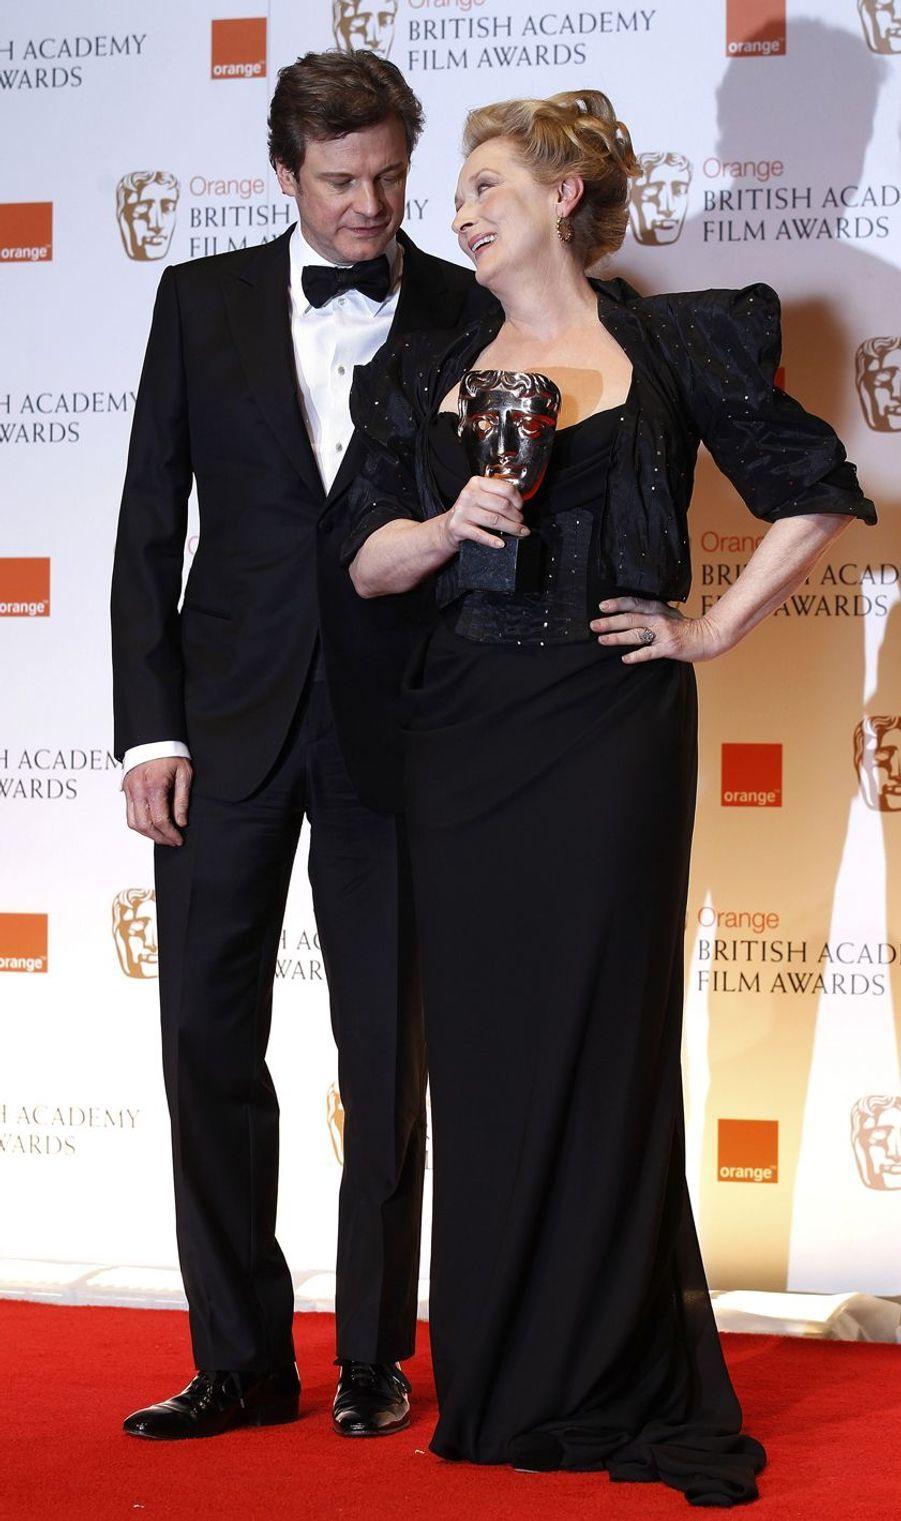 Meryl Streep et Colin Firth à Londres, le 12 février 2012